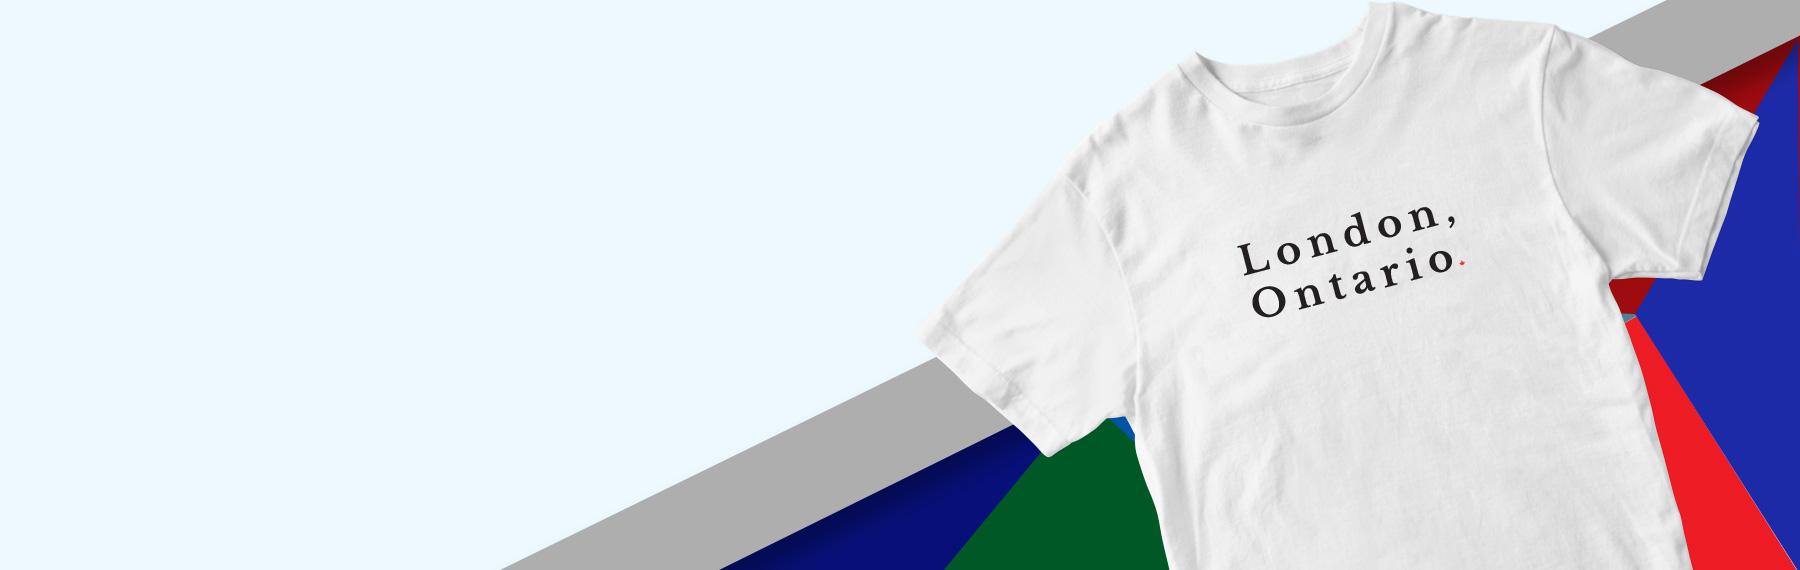 14894c3be155b Order Custom T-Shirts in London | T-Shirt Elephant